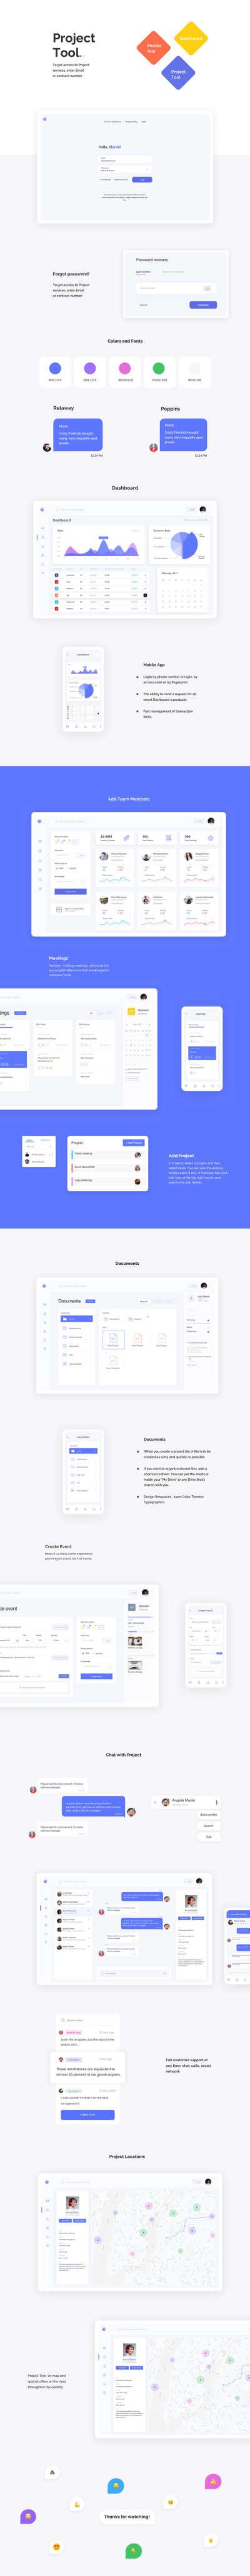 Team Work Dashboard UI Kit